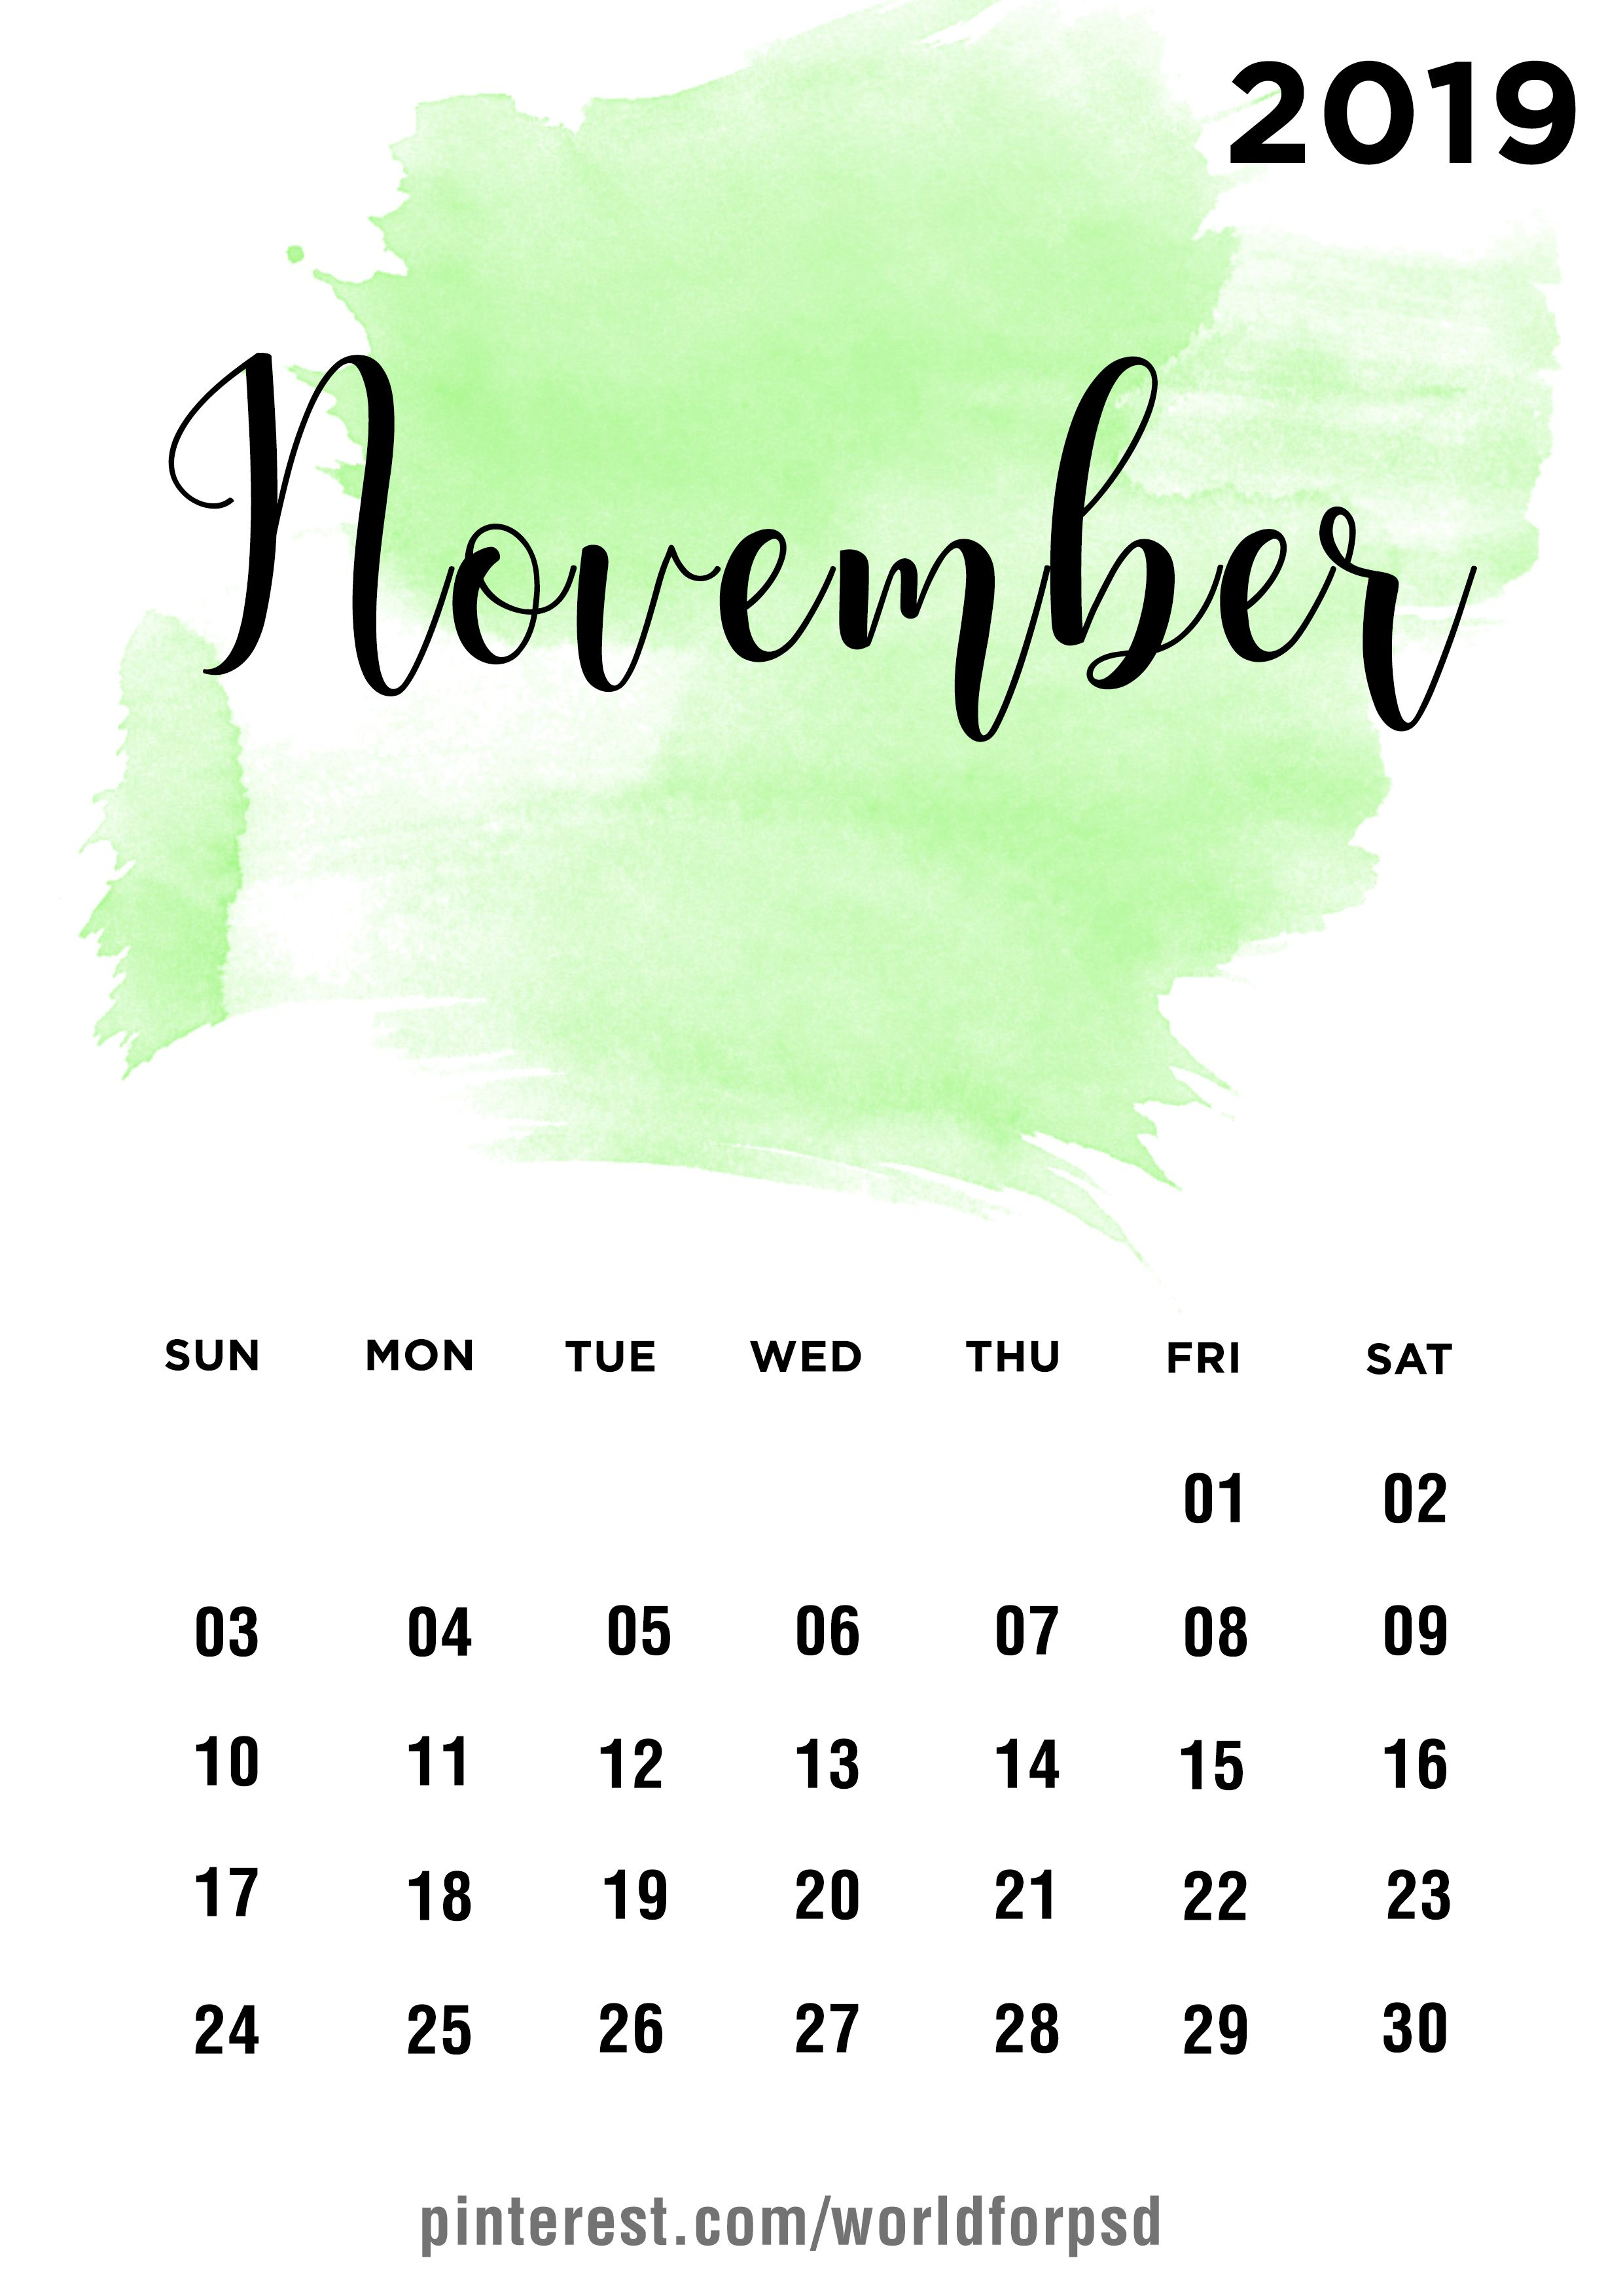 November 2019 February 2019 Calendar November 2019 Calendar Design #calendar #calendarideas #newyear